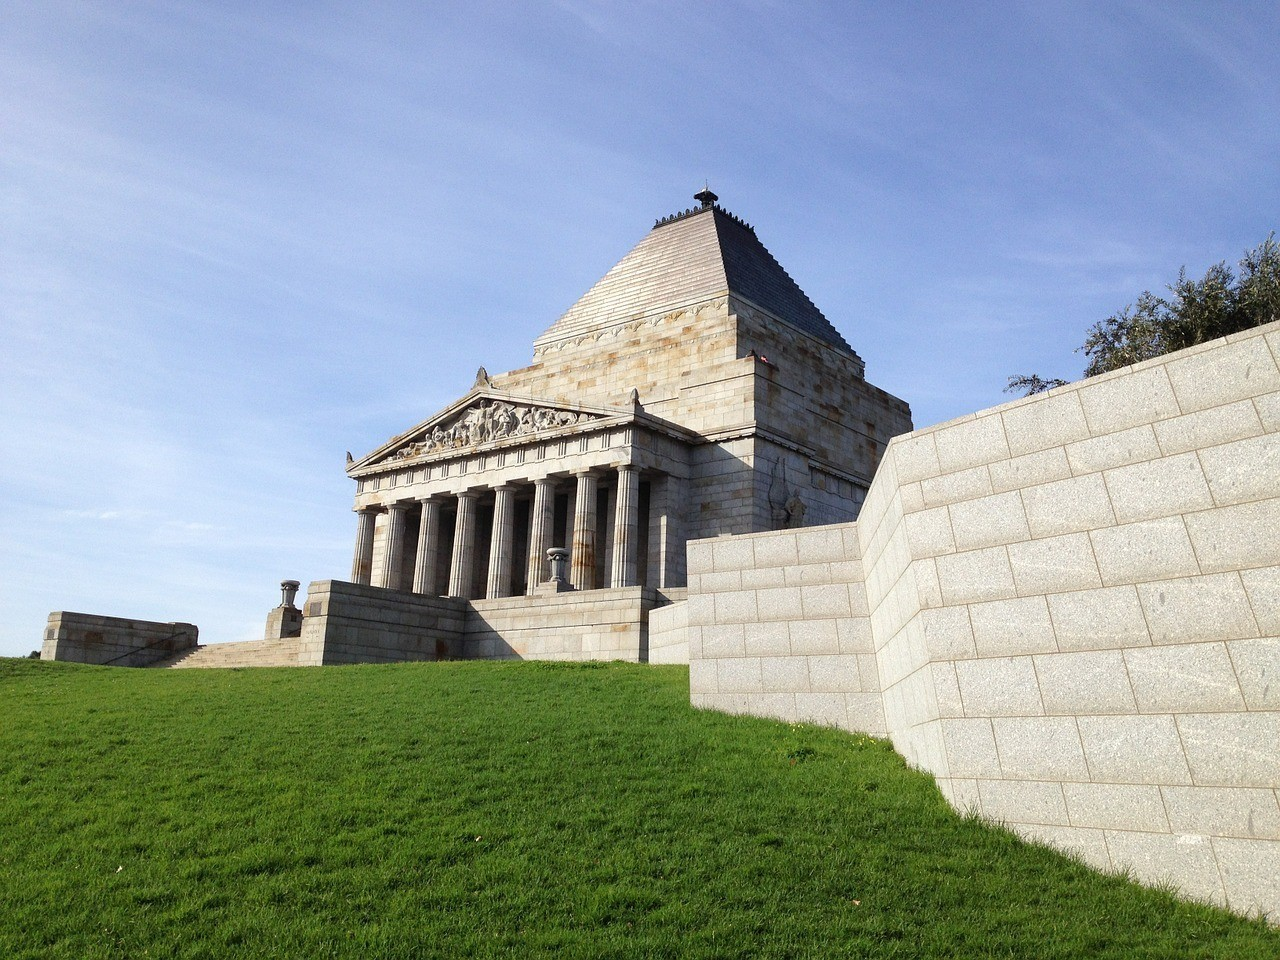 shrine-of remembrance-melbourne